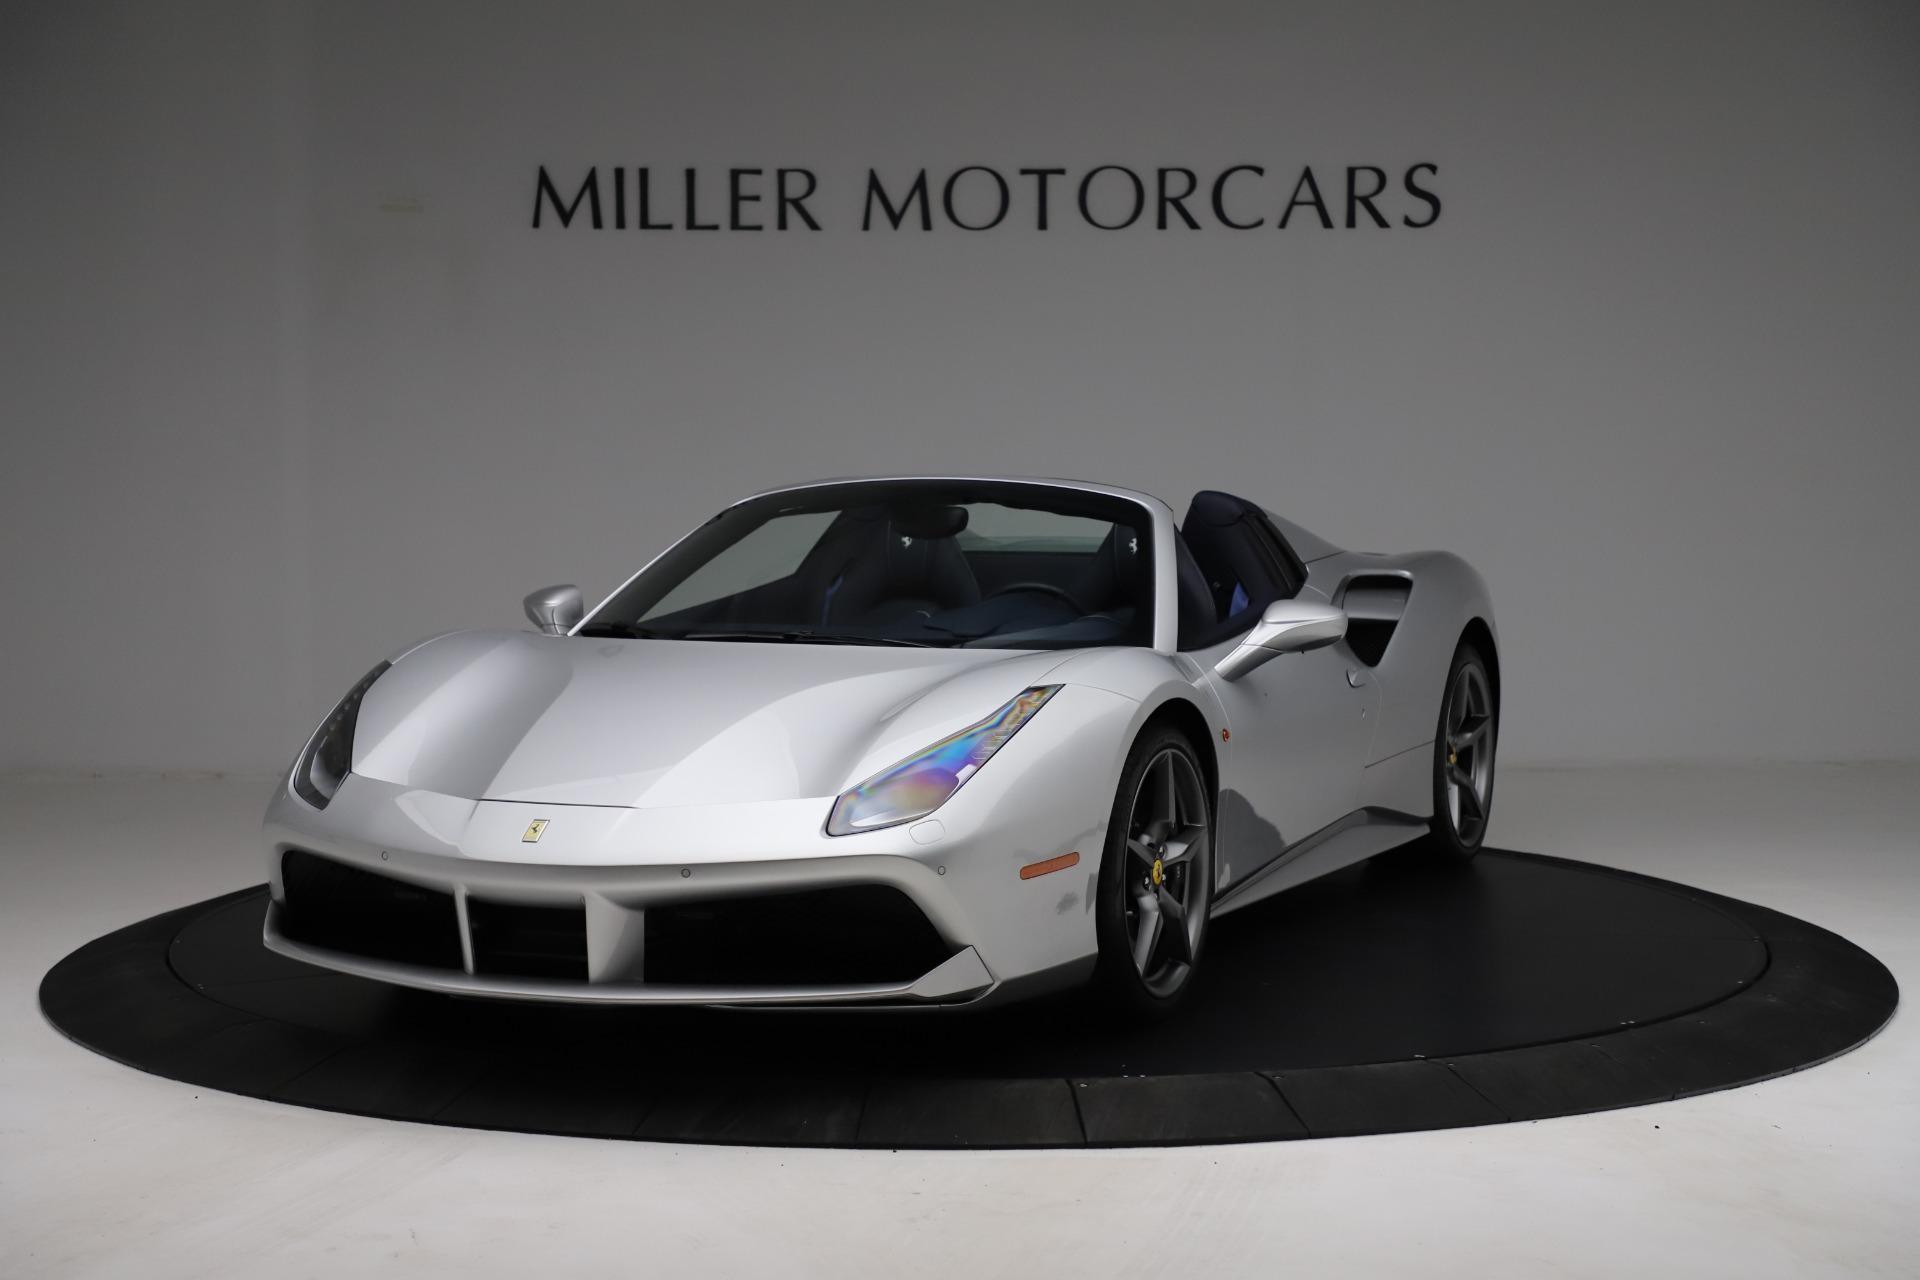 Used 2017 Ferrari 488 Spider for sale $284,900 at Maserati of Westport in Westport CT 06880 1